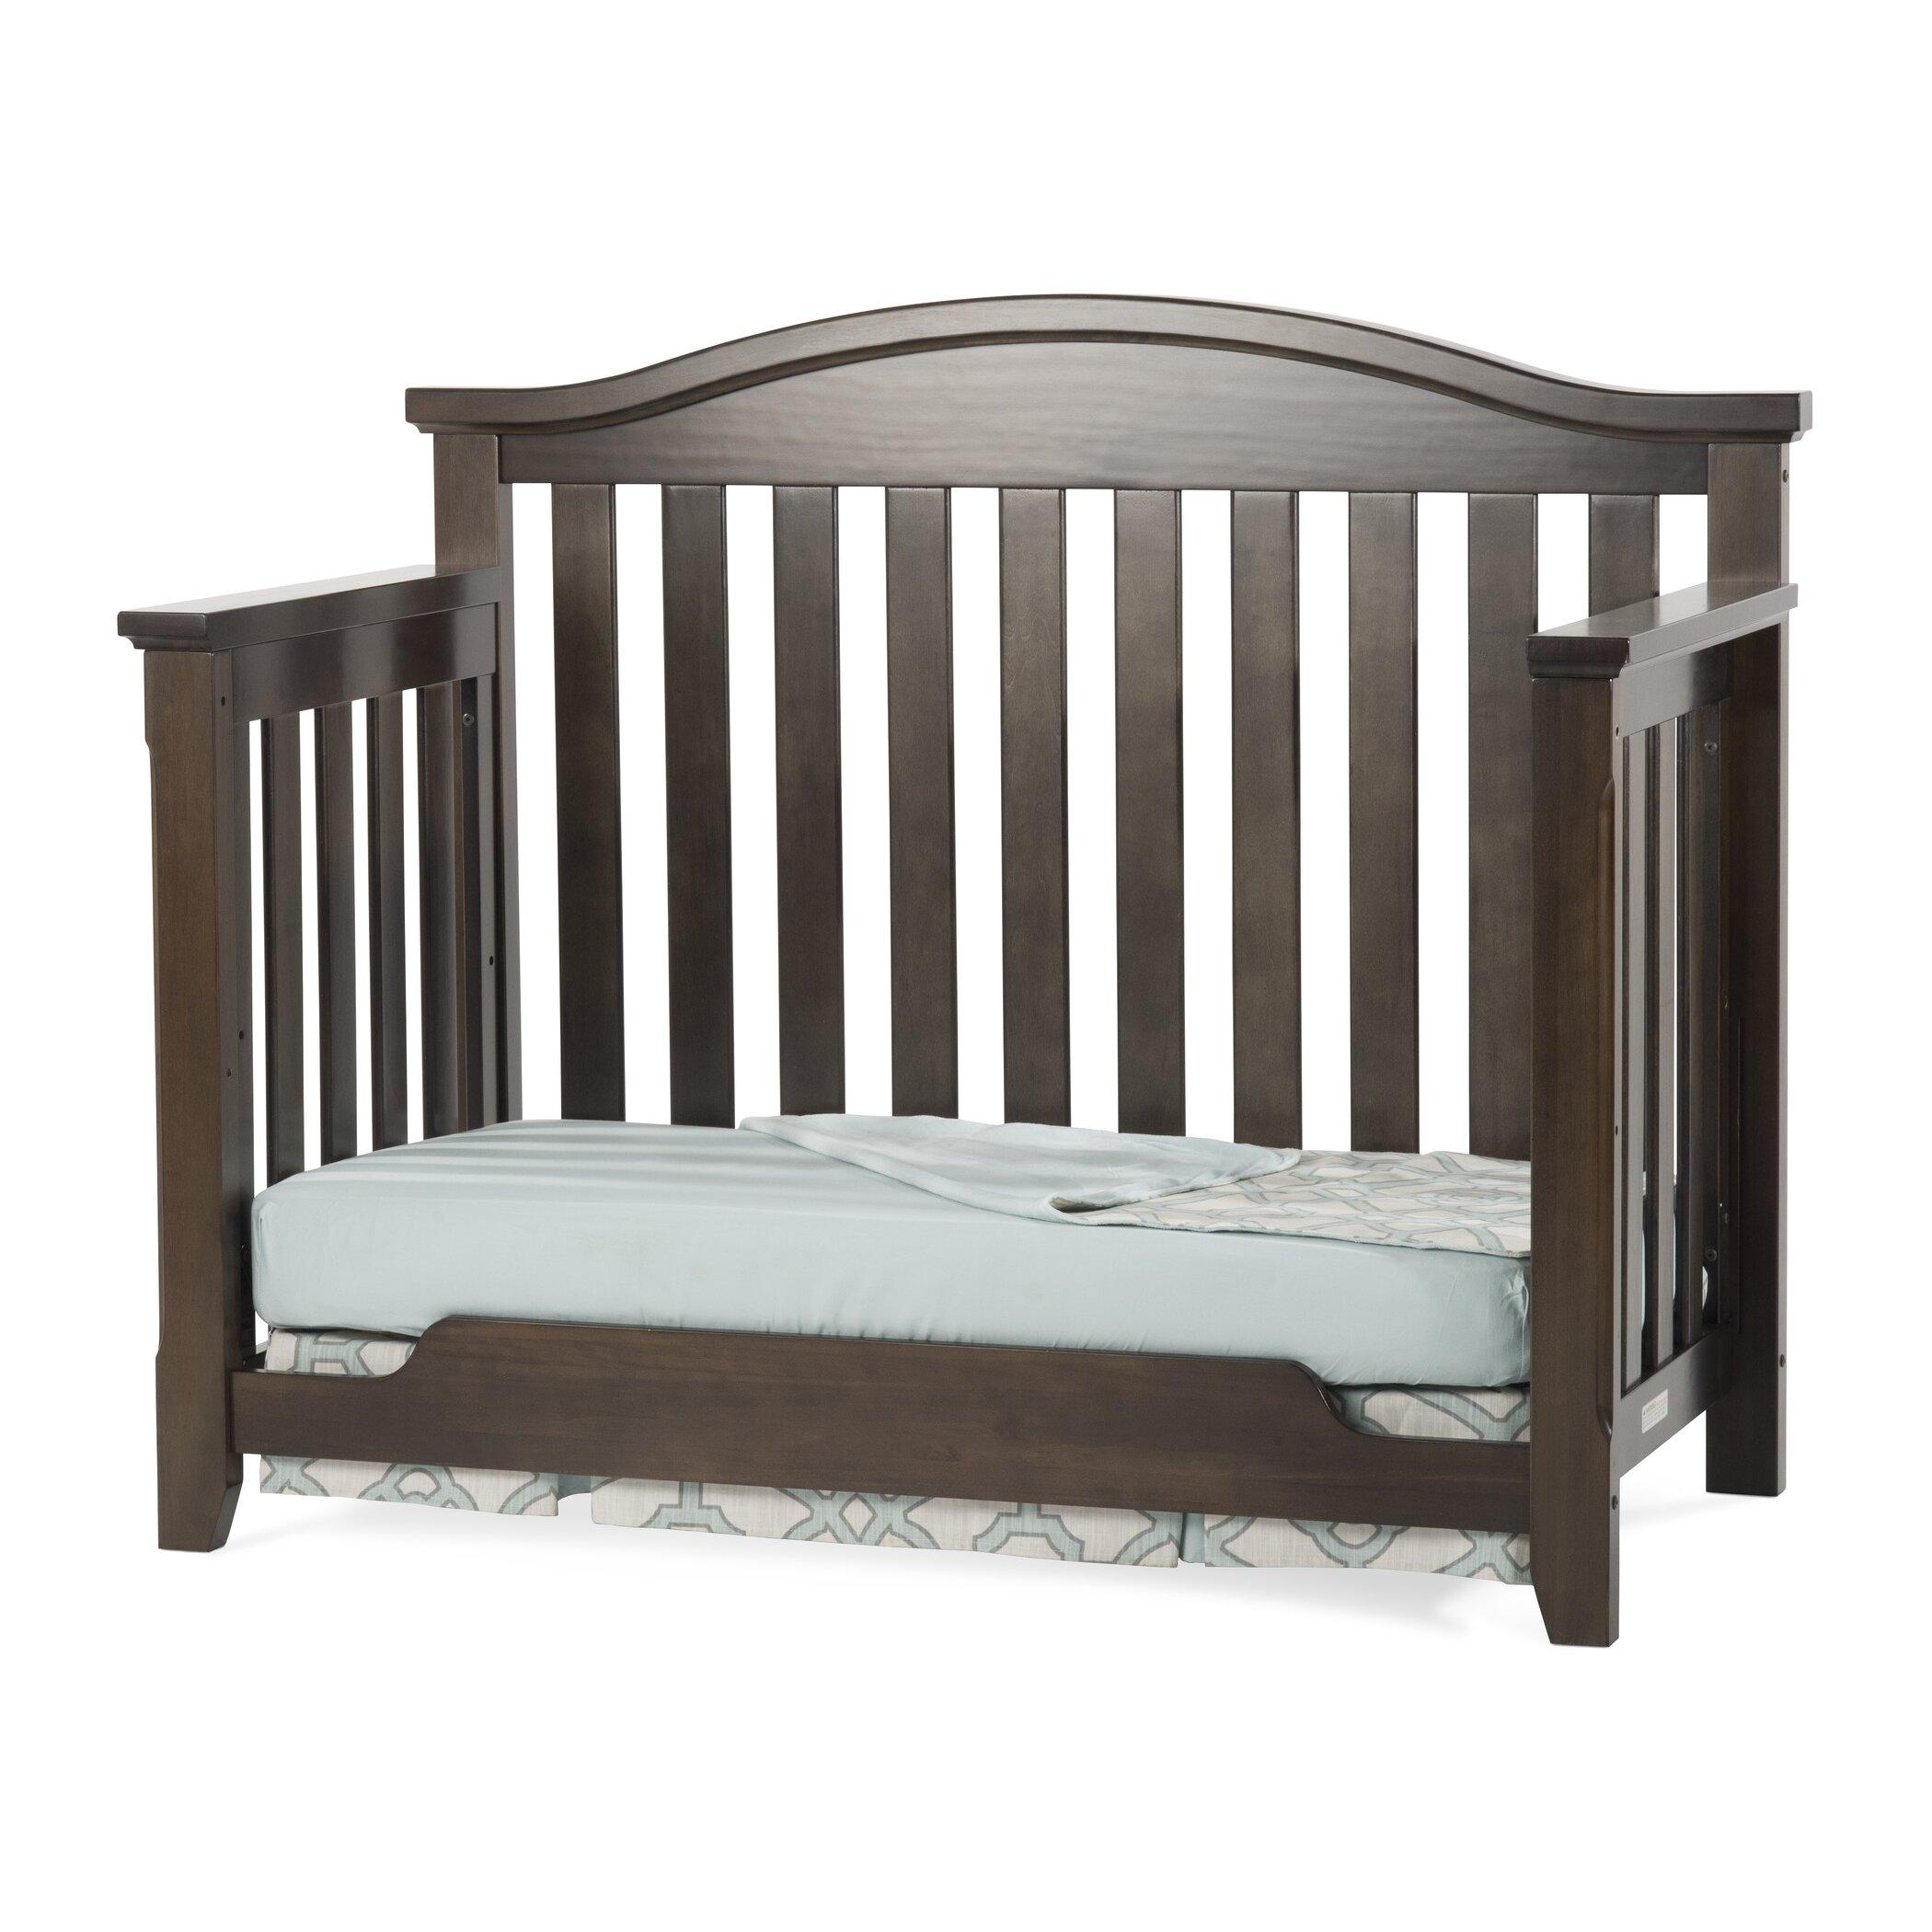 baby convertible crib davinci kalani 4 in 1 convertible. Black Bedroom Furniture Sets. Home Design Ideas